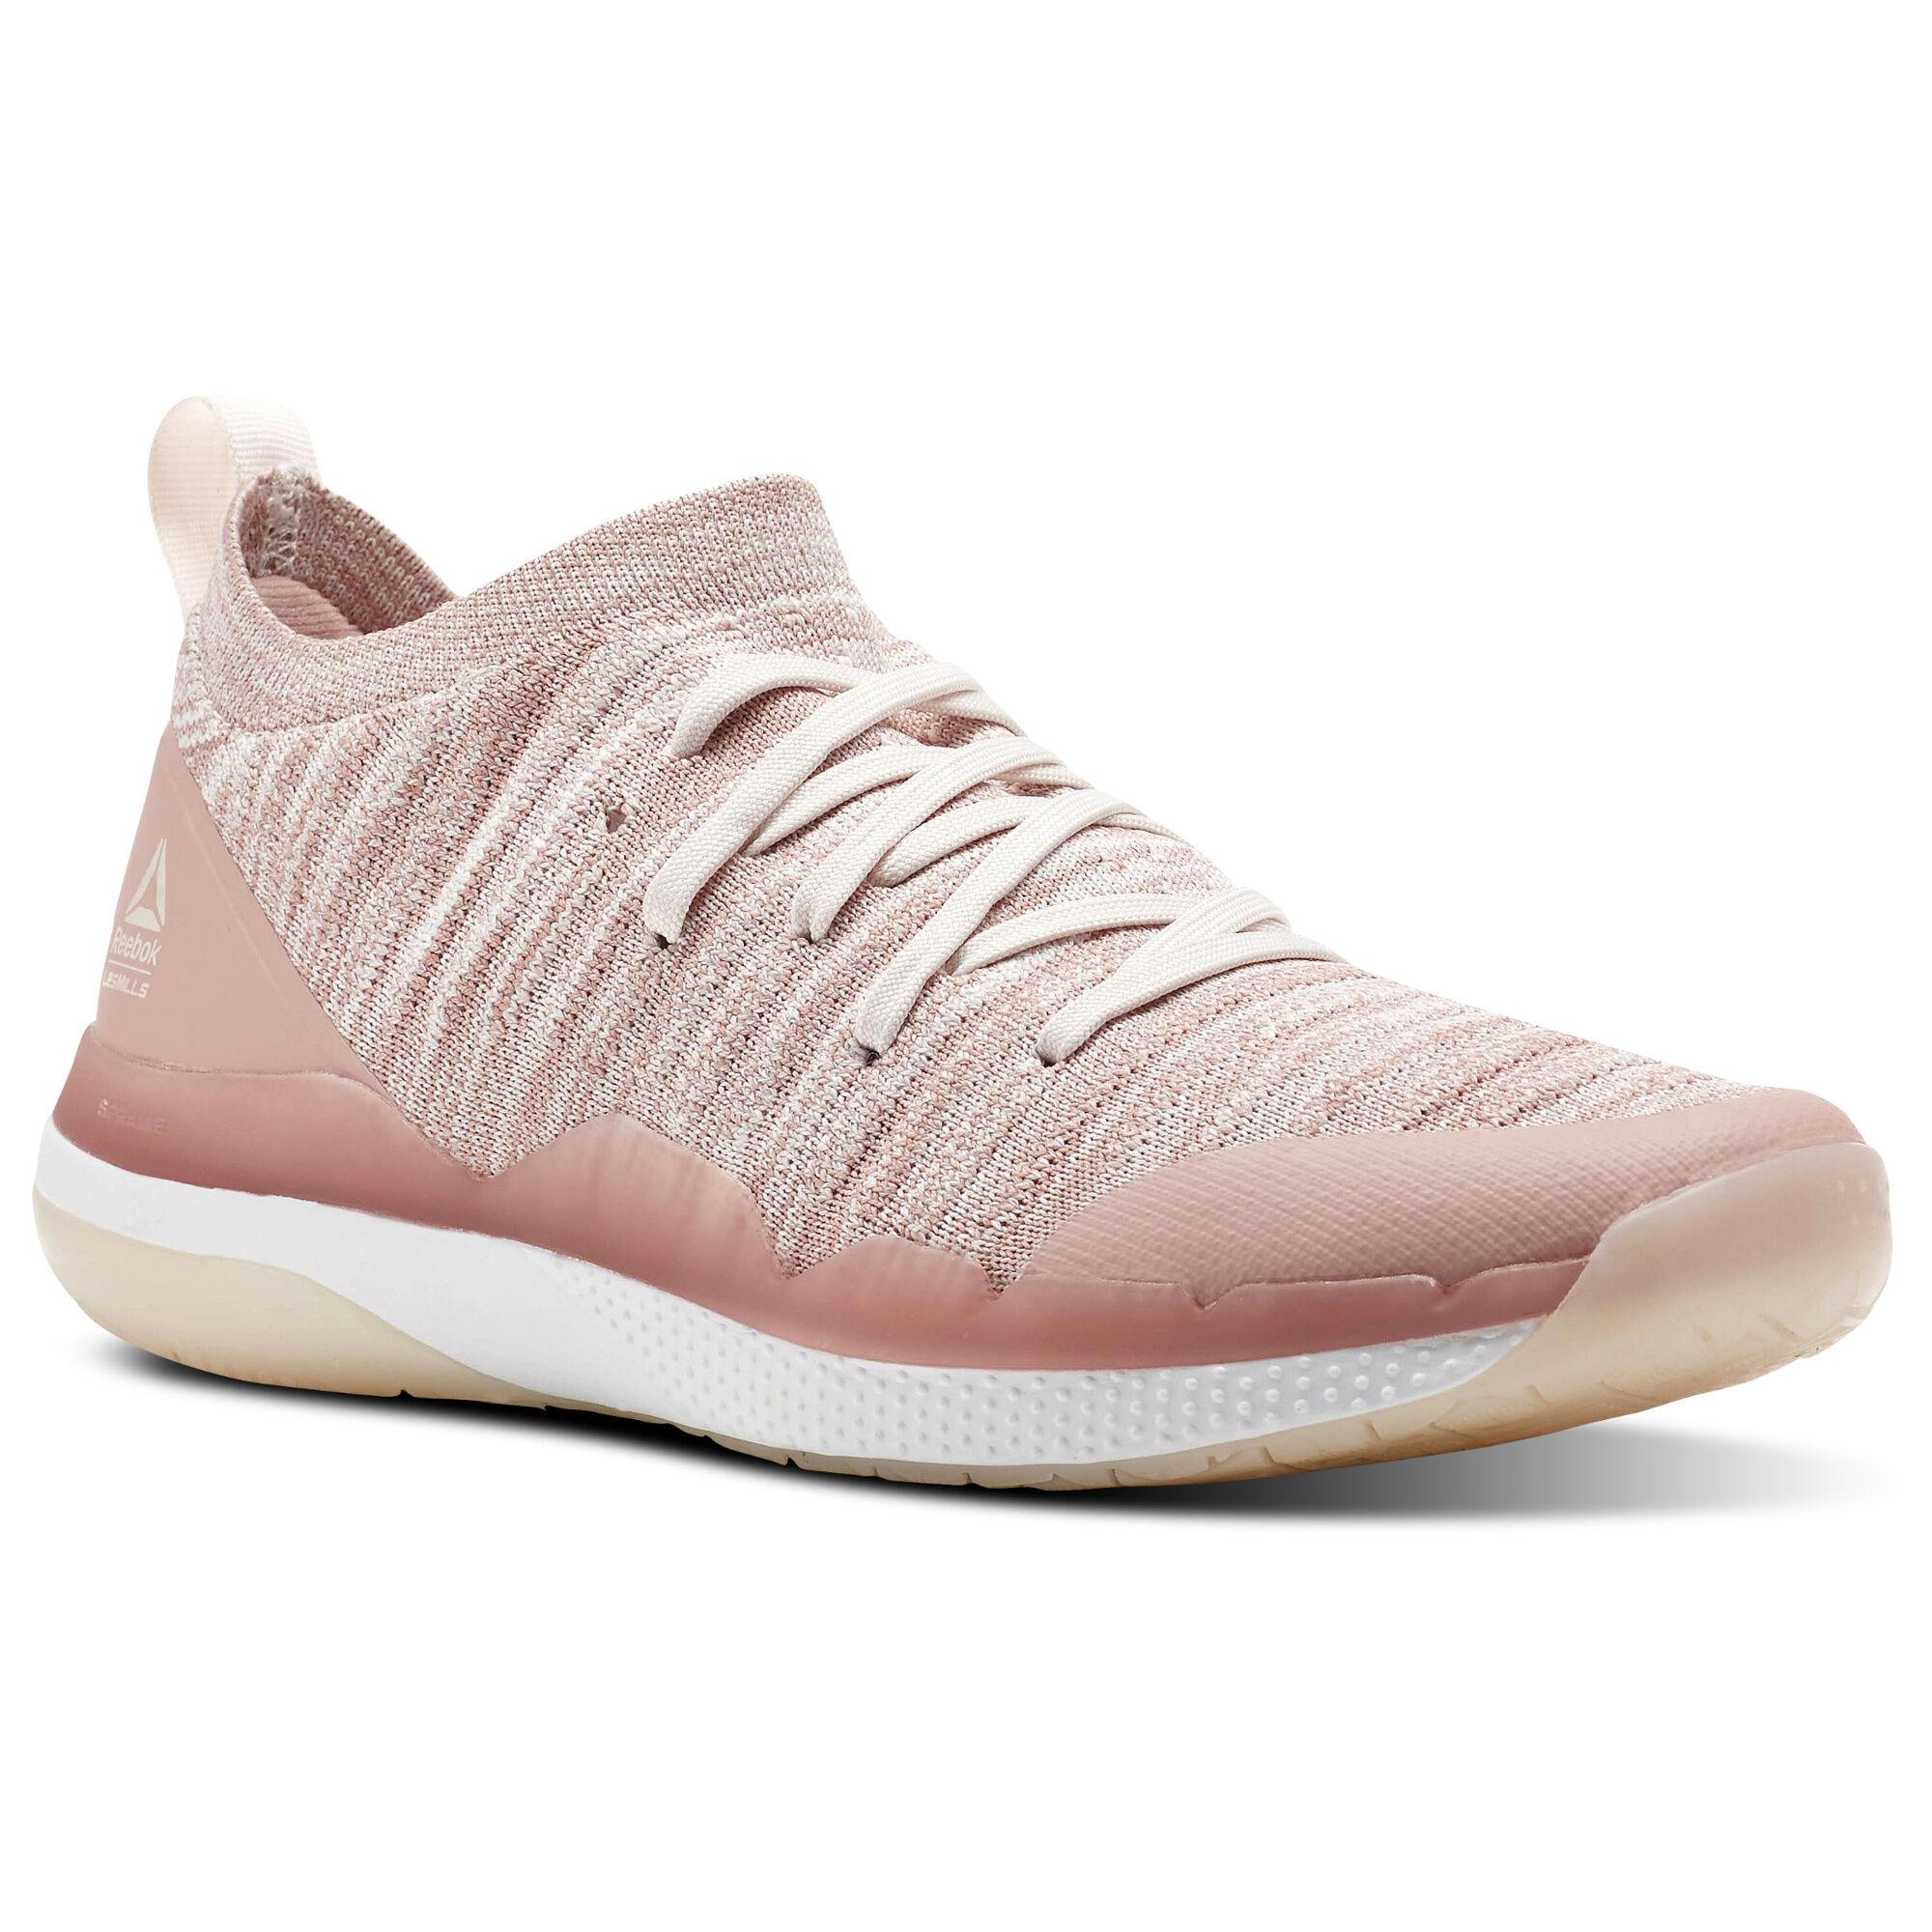 Tr Pinkpale Lm Cn5952 Ultk Chalk Ultra Pinkwhite Circuit Reebok SwqpUEY